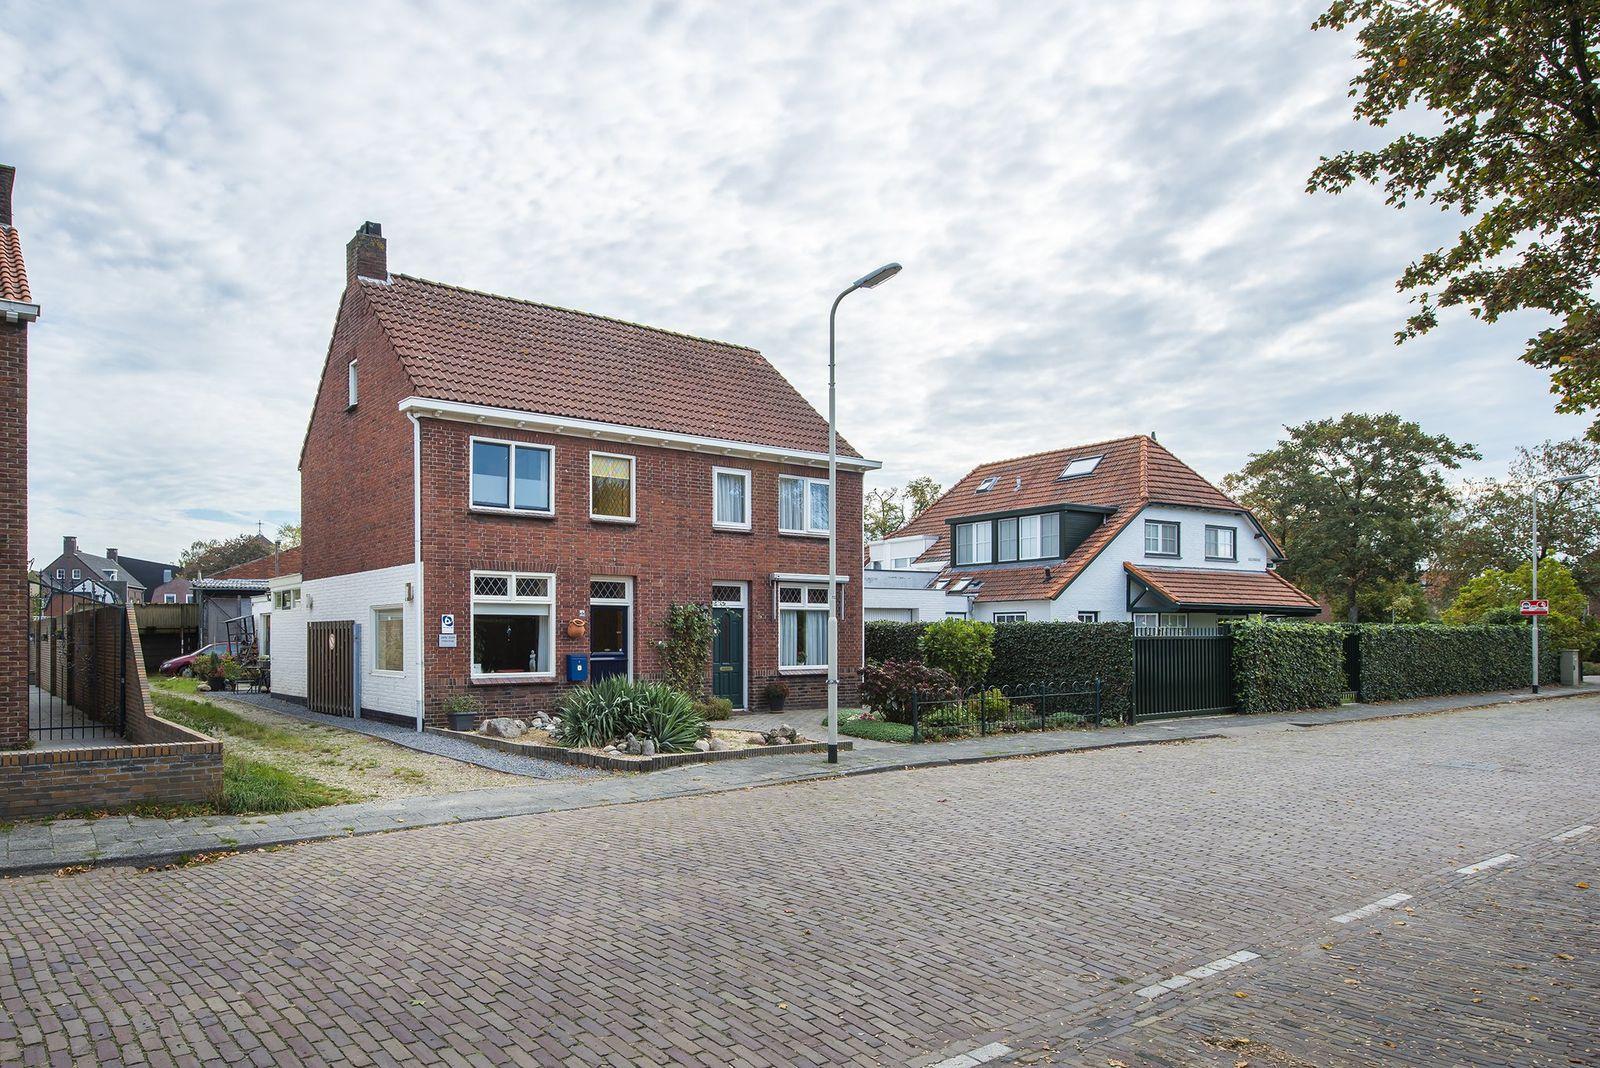 Piet Heijnstraat 4, Roosendaal